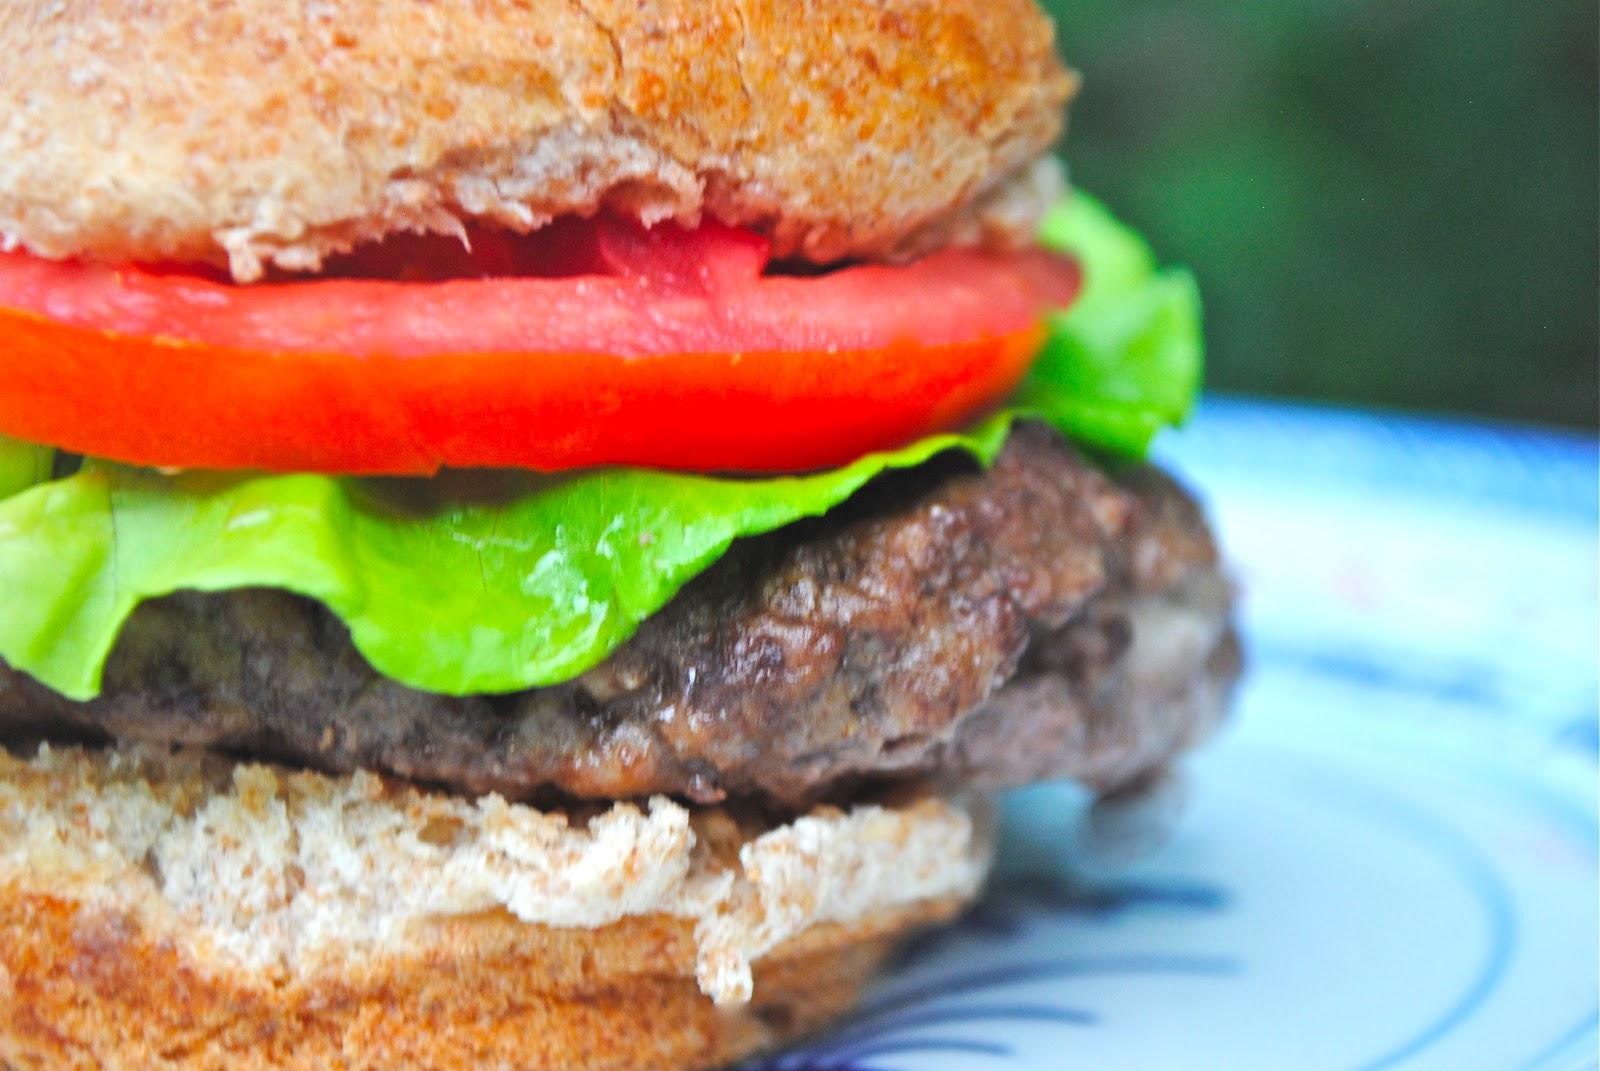 Horseradish, Cheddar, and Caramelized Onion-Stuffed Burgers